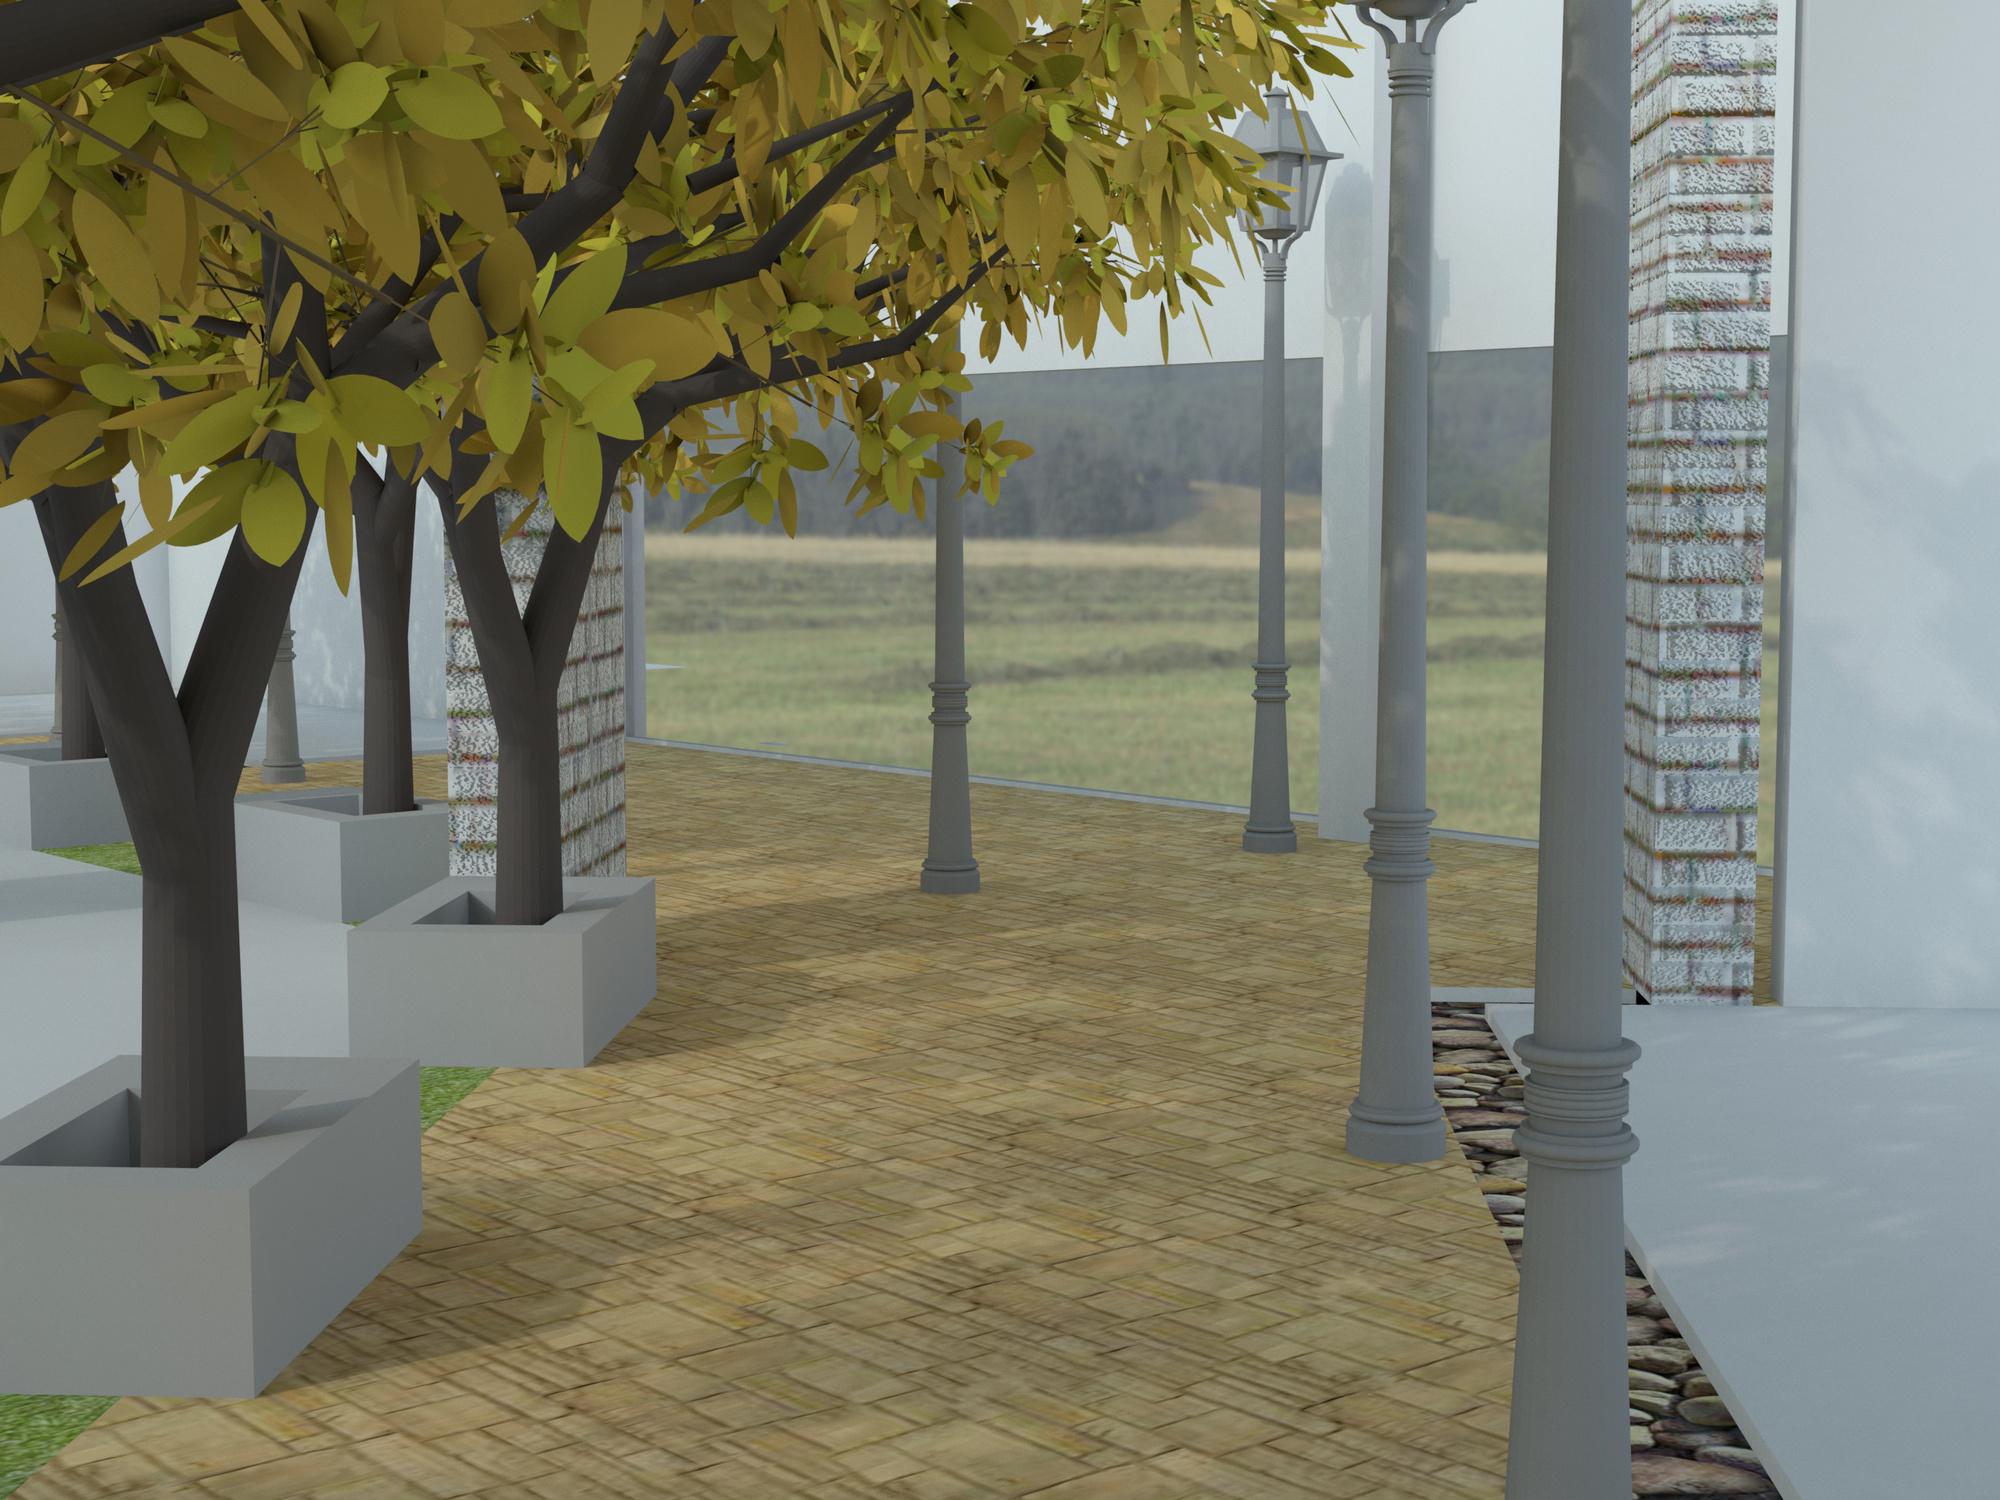 Raas-rendering20150119-8802-tc9sqw